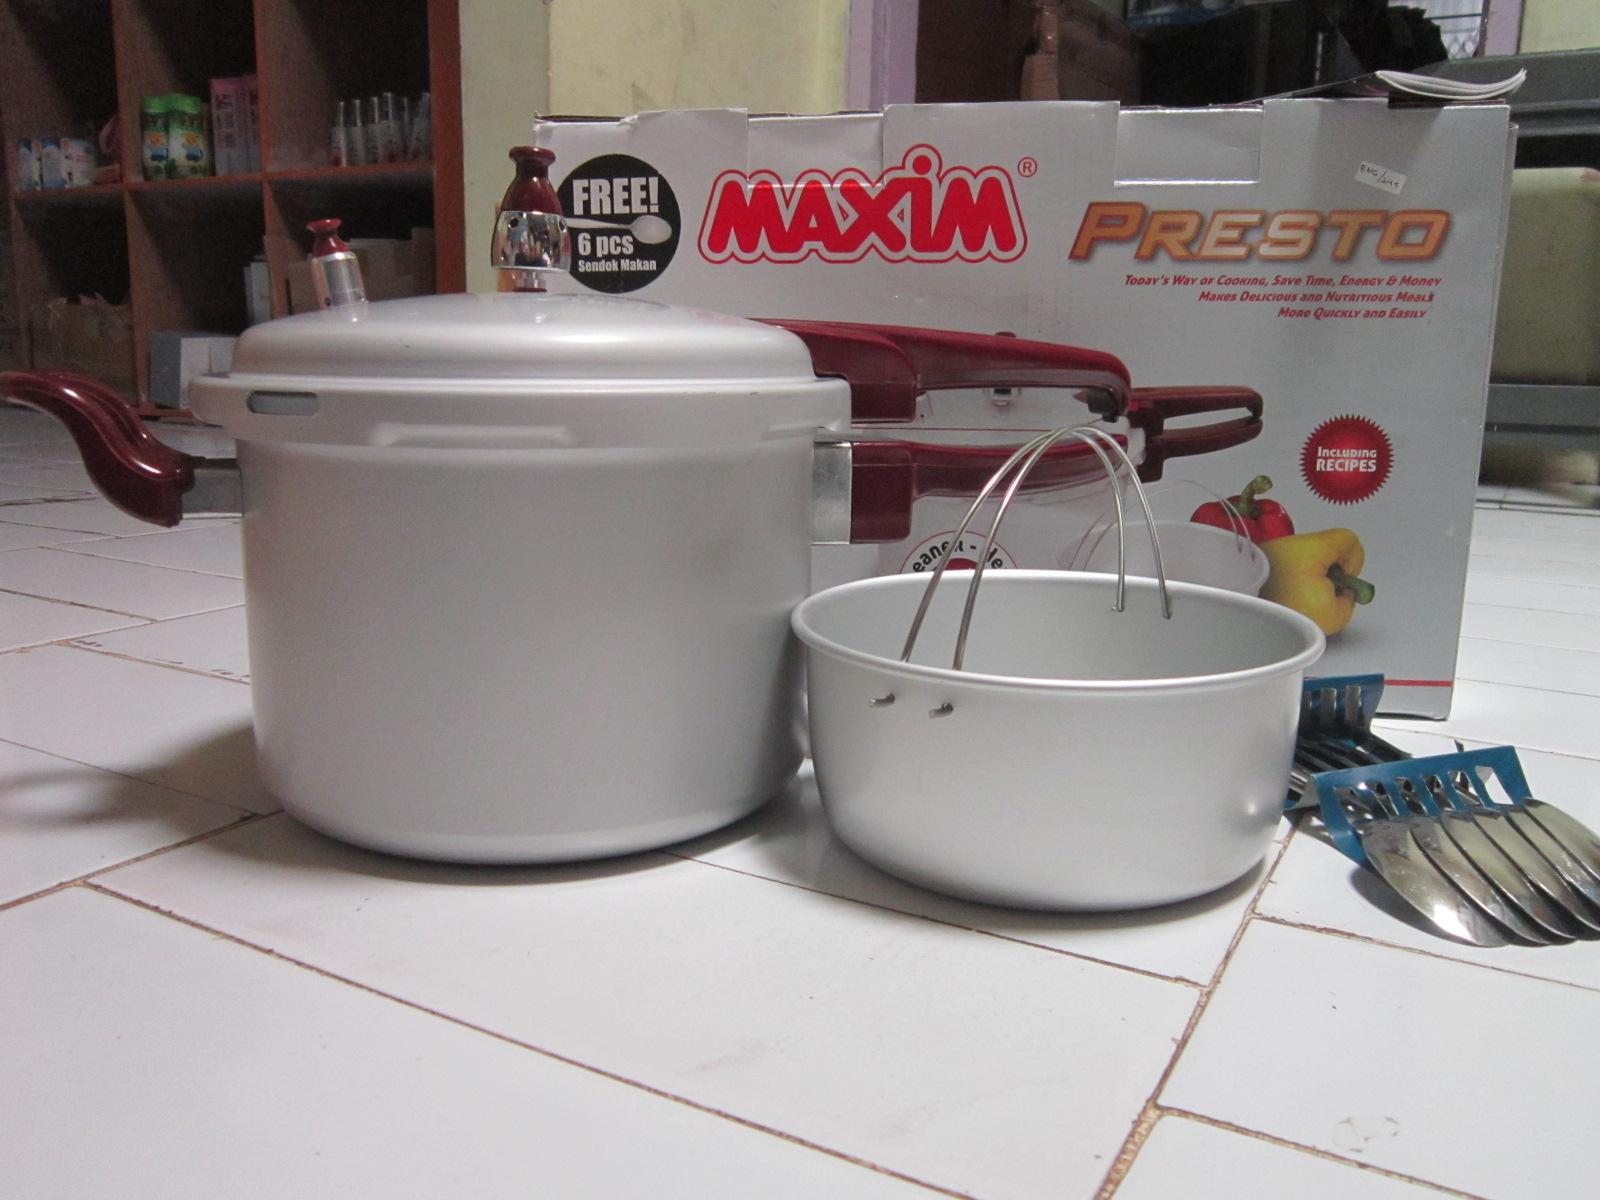 Whm Panci Presto 24cm 7 L Mxm Pt000100 Daftar Maxim Pressure Cooker 24 Cm Silver Jual Grosir 7liter Zalama